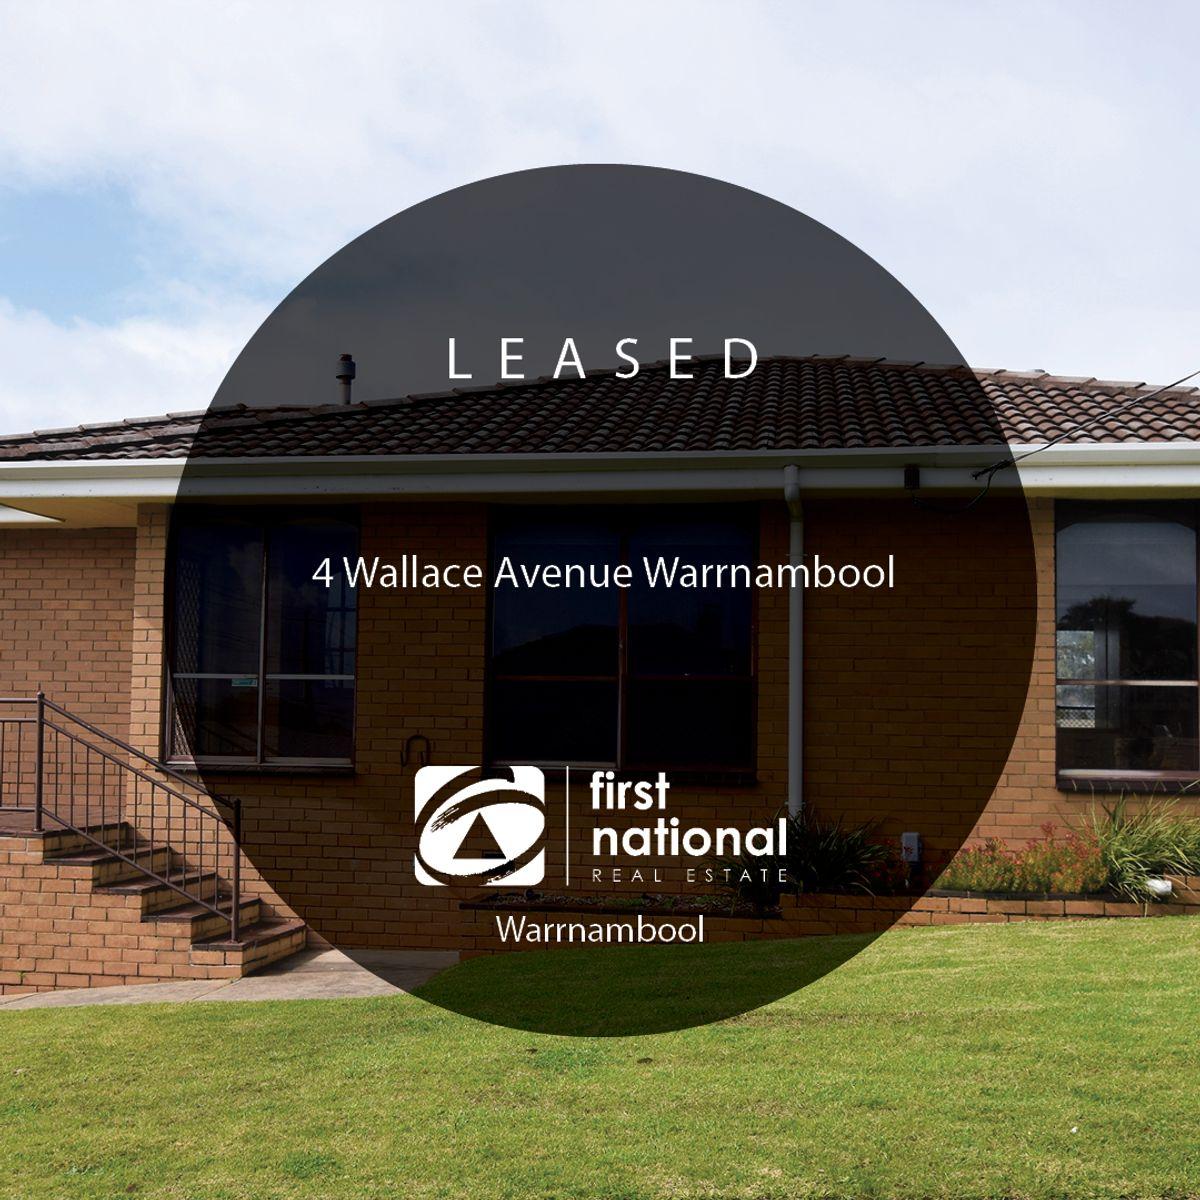 4 Wallace Avenue, Warrnambool, VIC 3280